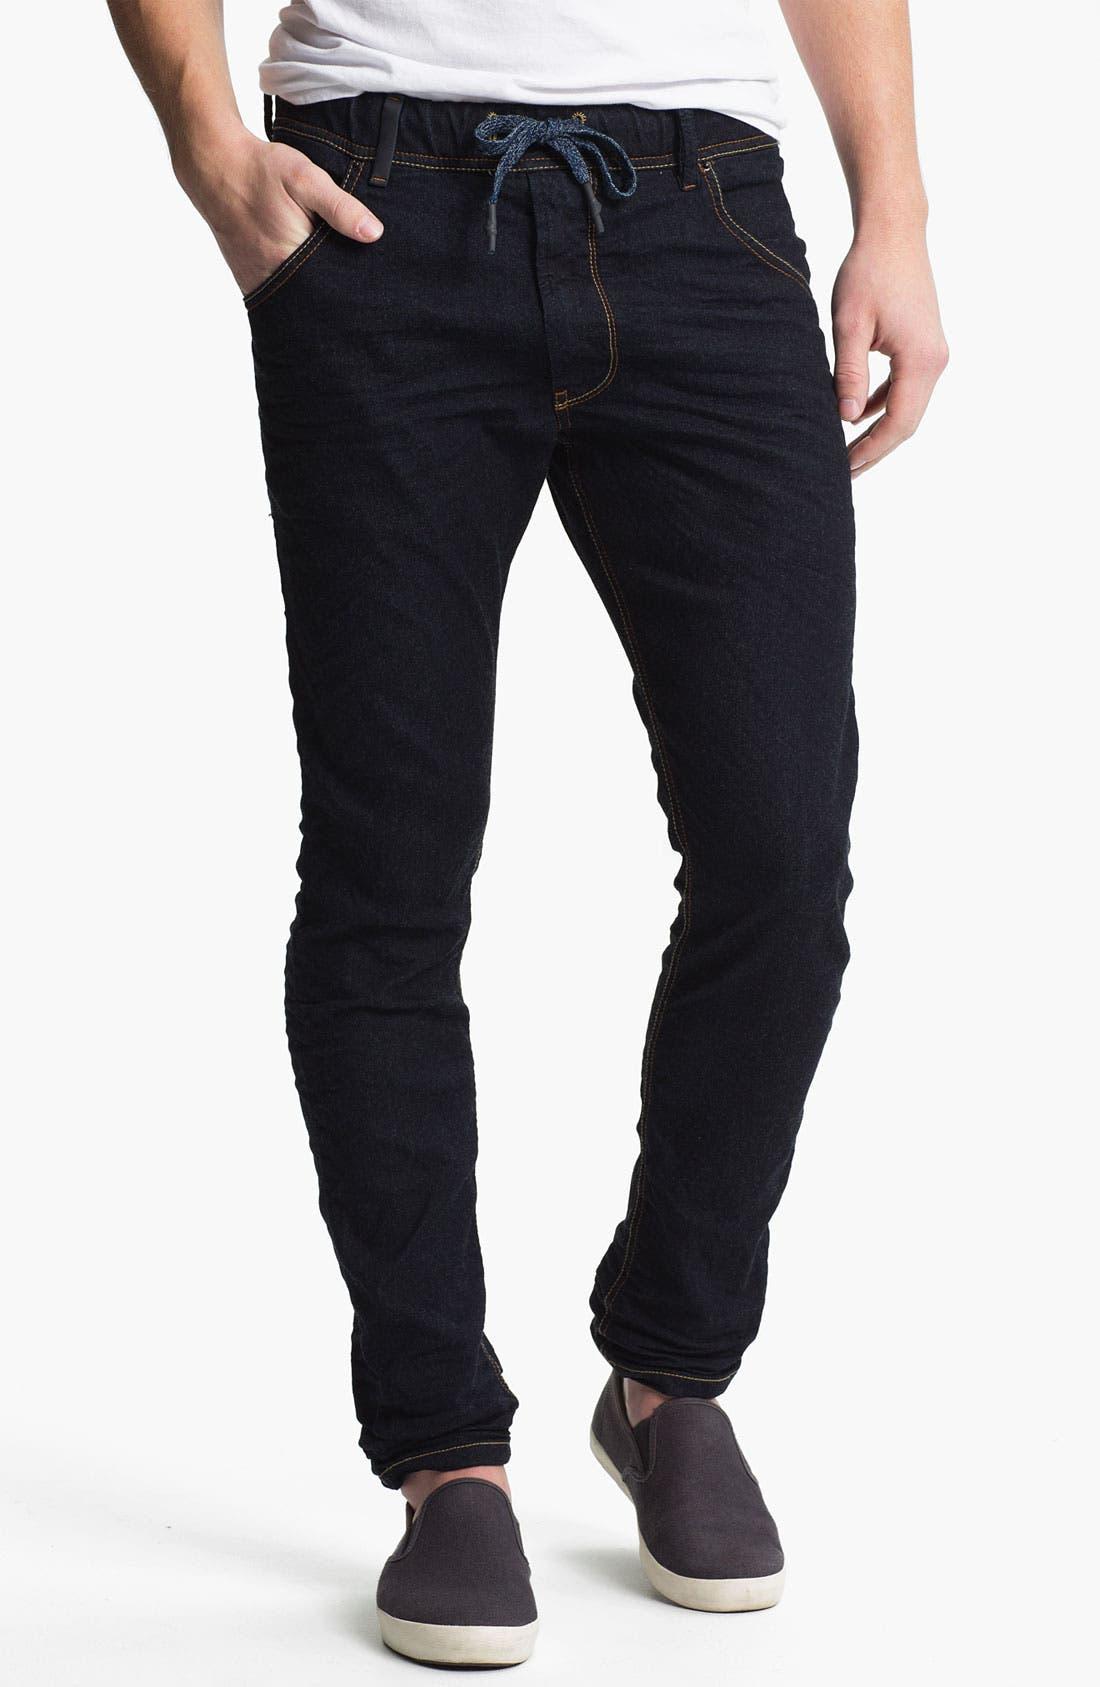 Alternate Image 1 Selected - DIESEL® 'Krooley - Jogg Jeans' Tapered Leg Sweatpants